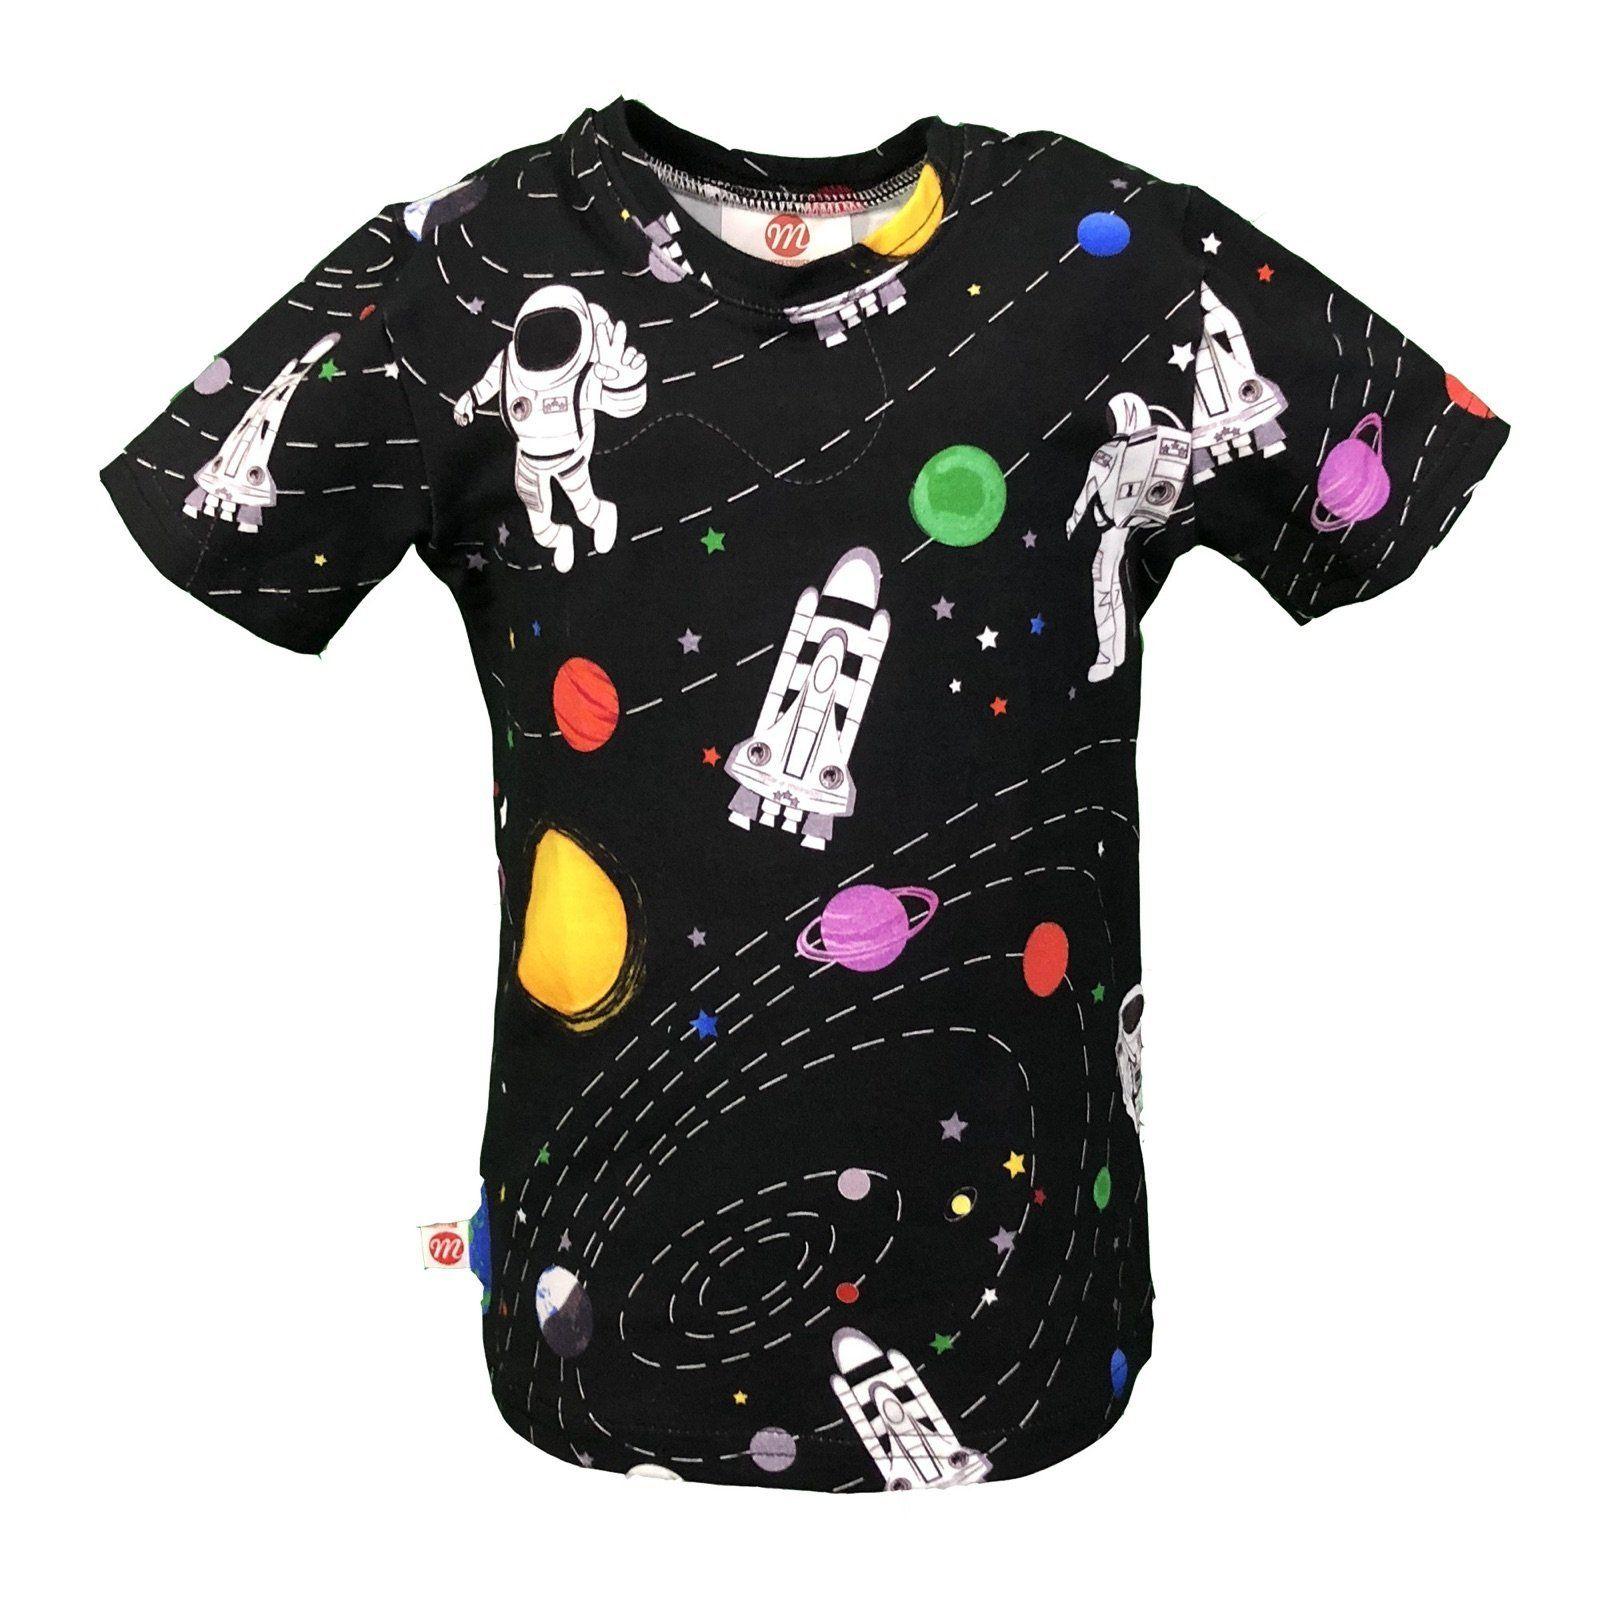 Astronaut Childrens Long Sleeve T-Shirt Boys Cotton Tee Tops